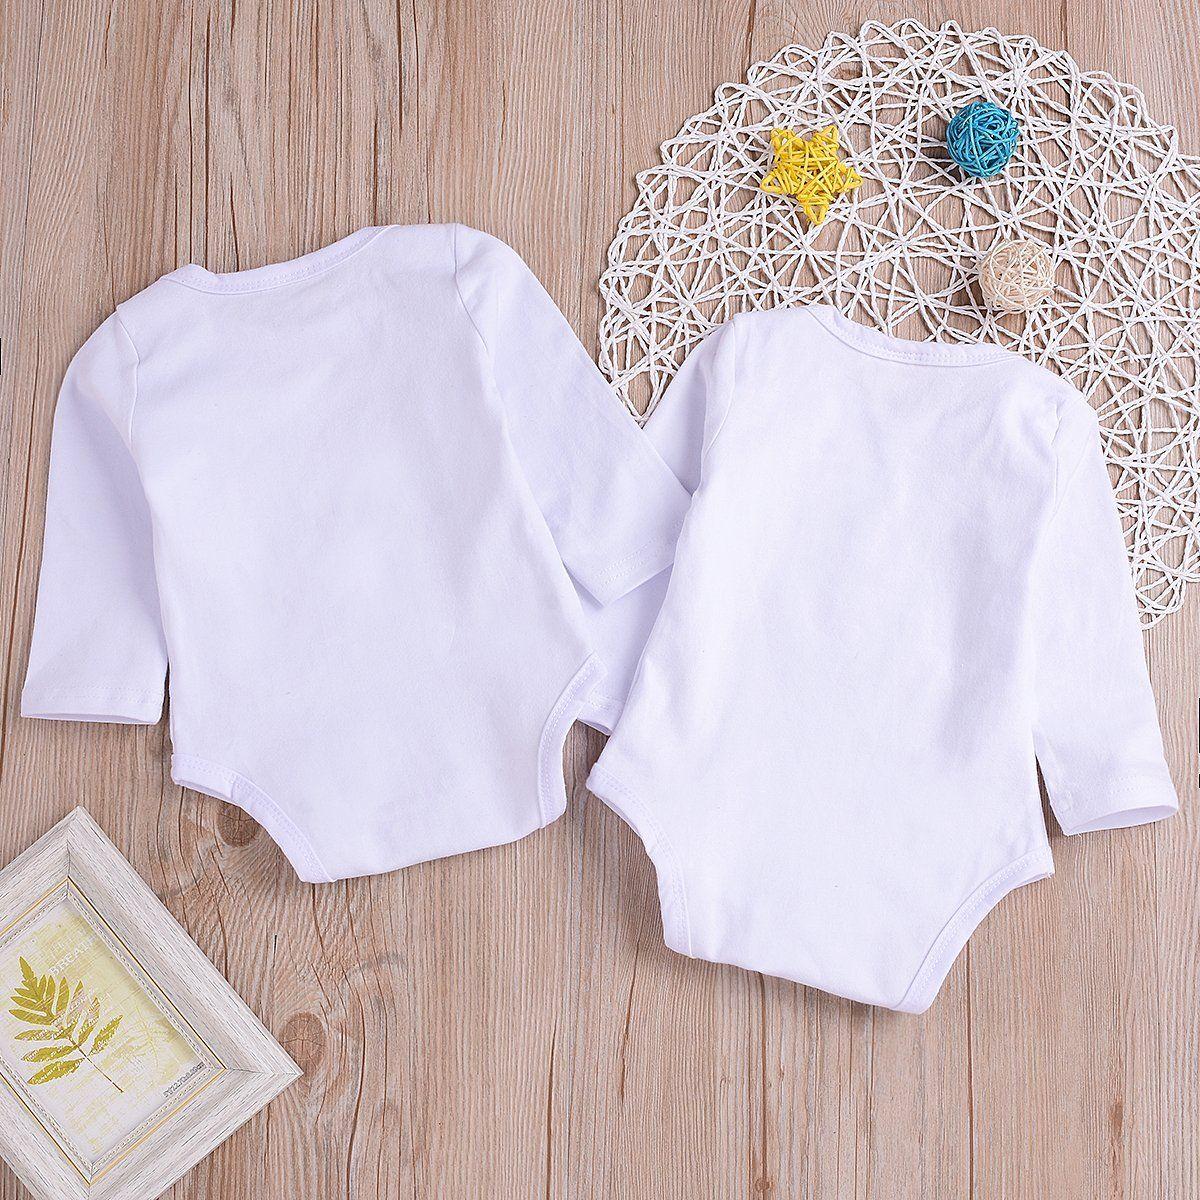 4cc2d2a555753 Mini honey 2Pcs Infant Twins Baby Boys Girls Long Sleeve Letter Print  Romper Bodysuit Summer Outfit